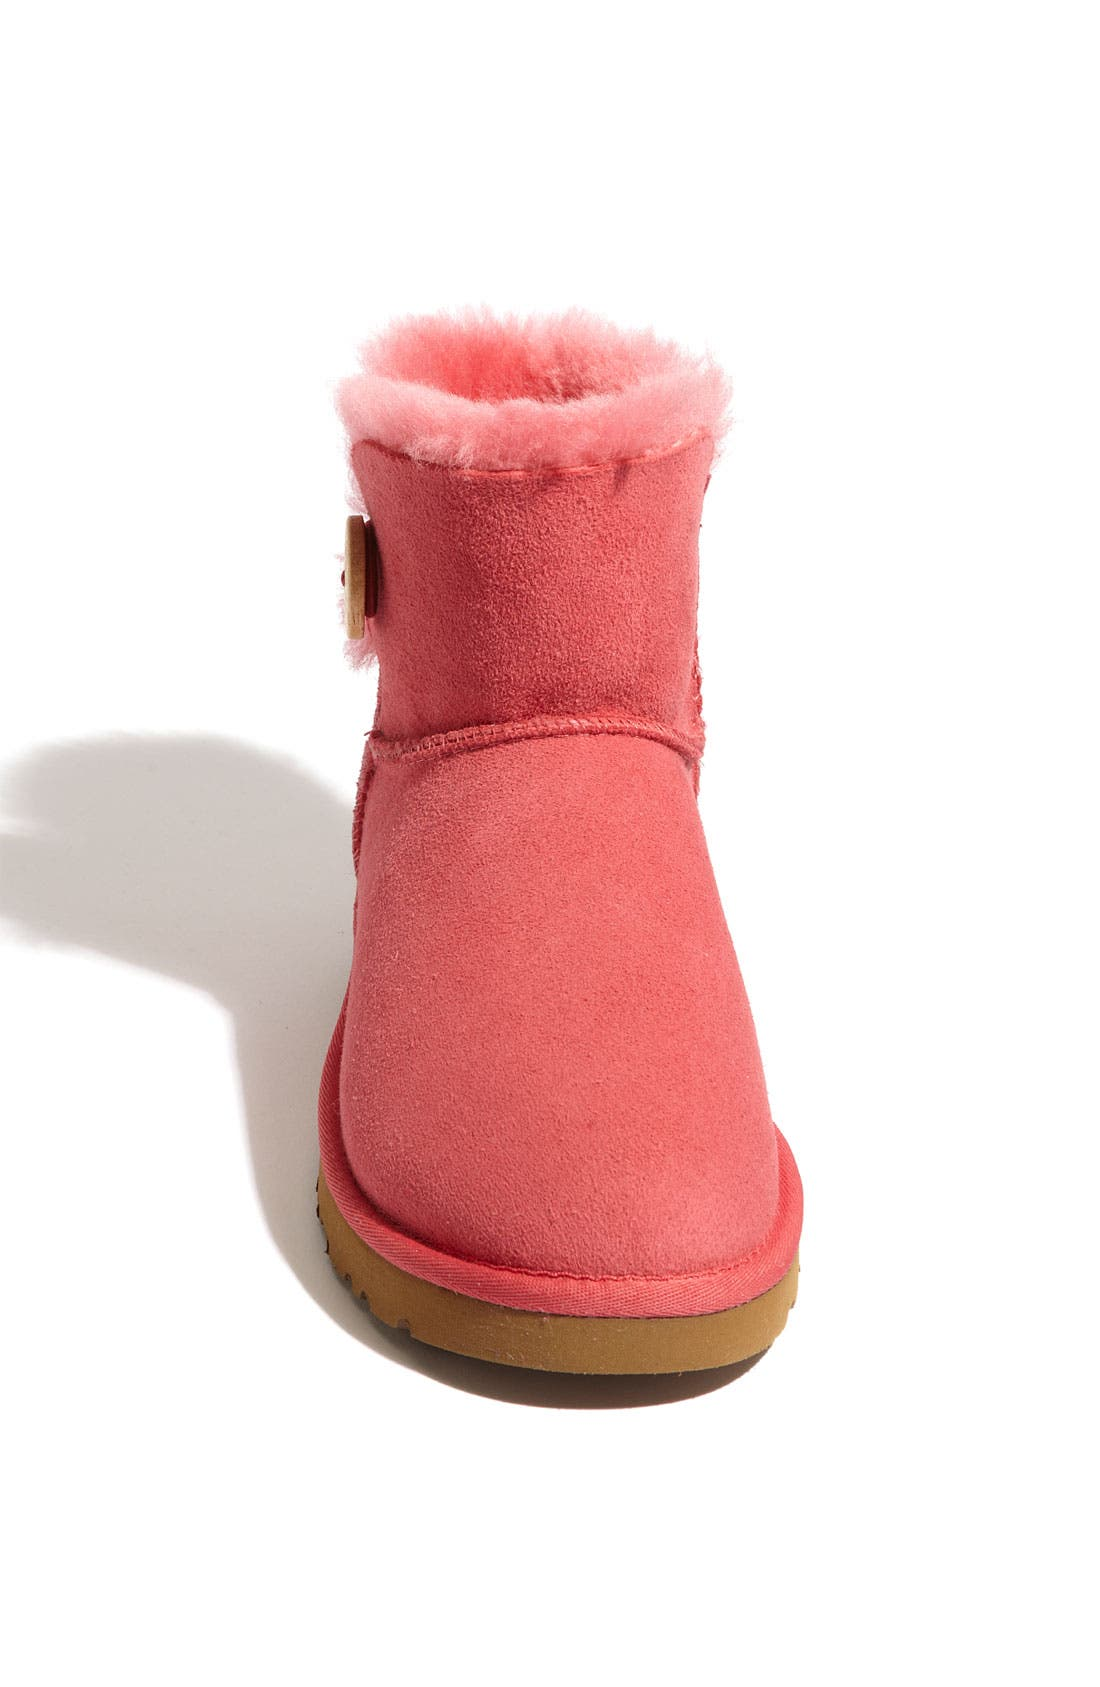 Alternate Image 3  - UGG® 'Mini Bailey Button' Boot (Women)